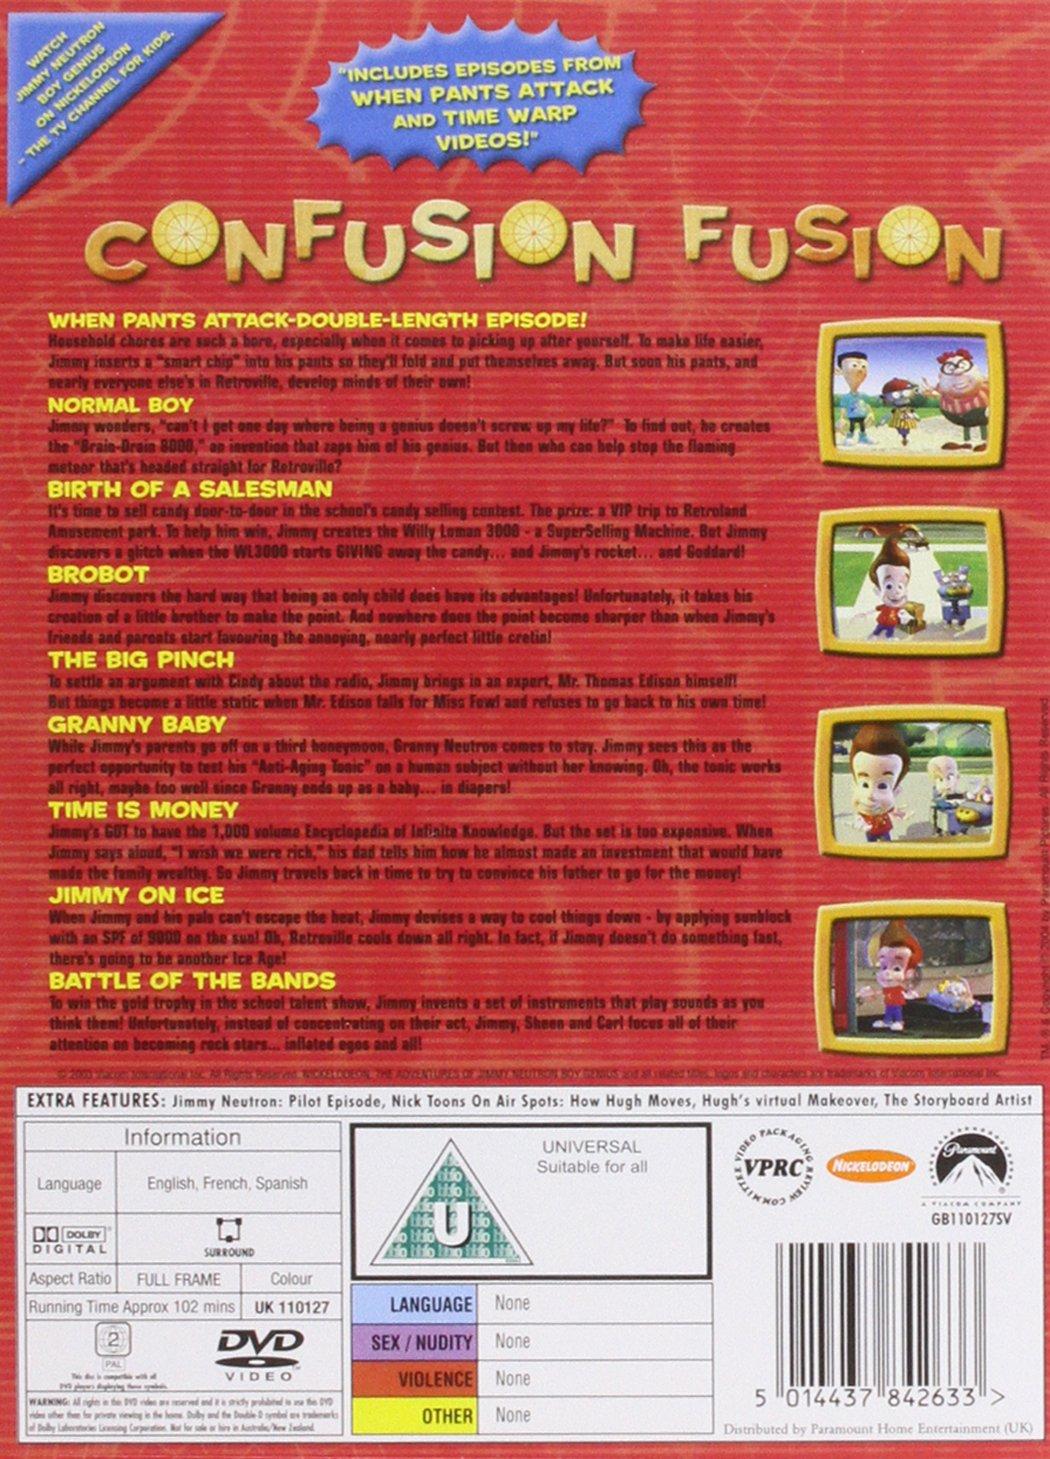 Jimmy Neutron - Boy Genius: Confusion Fusion [DVD]: Amazon